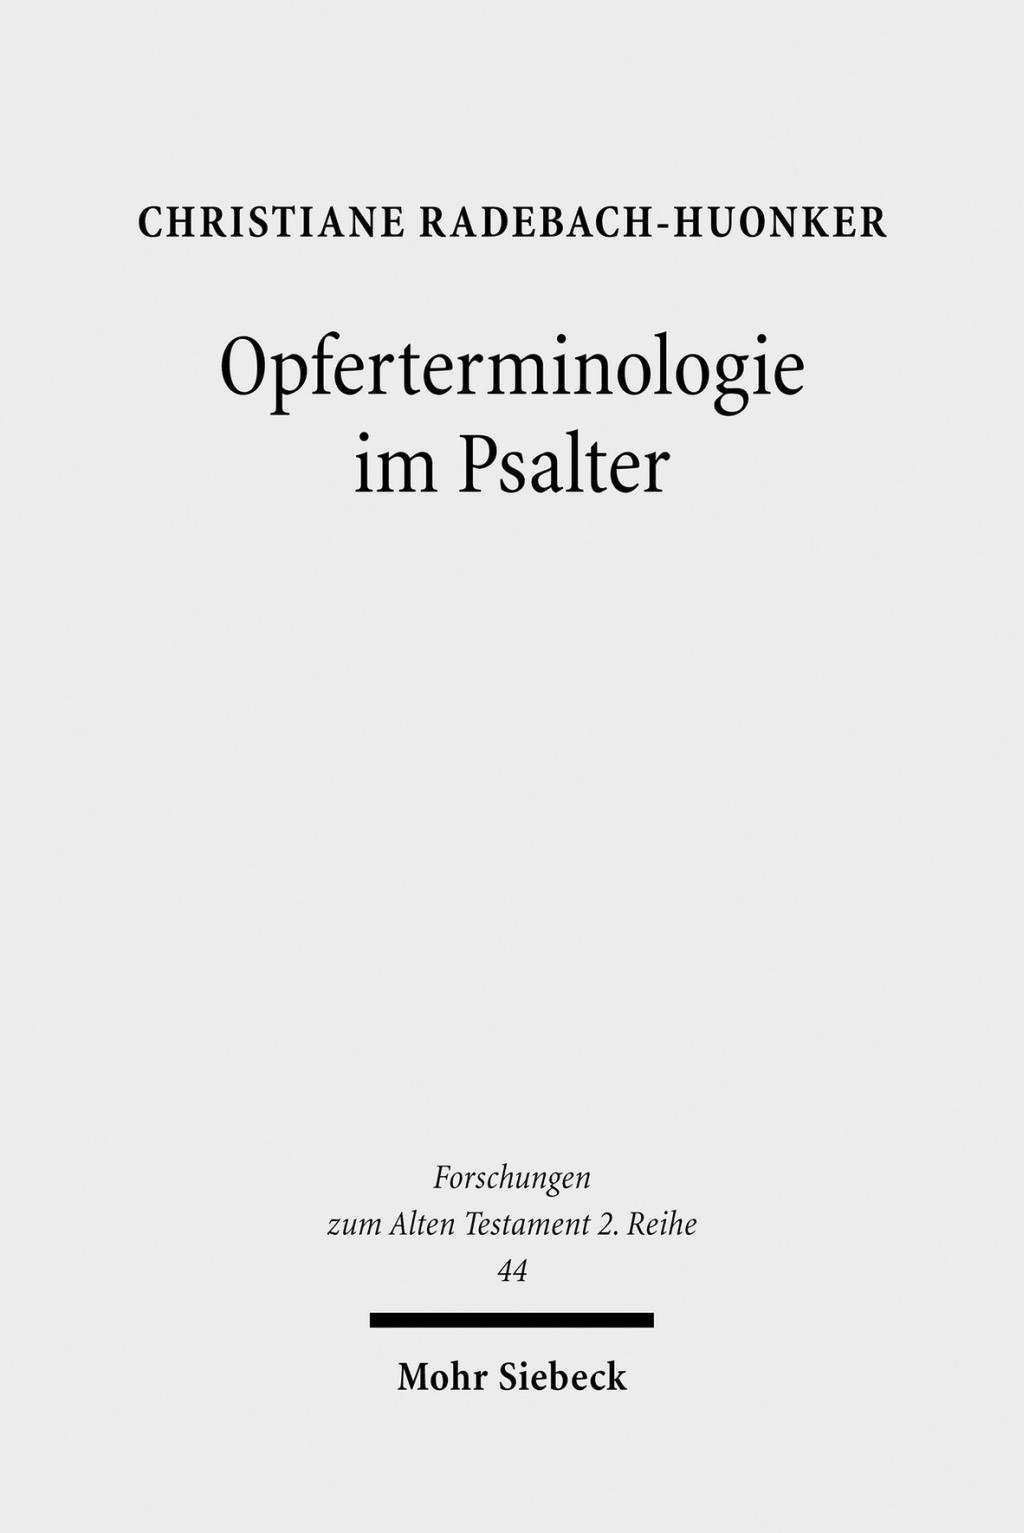 Opferterminologie im Psalter Christiane Radebach-Huonker